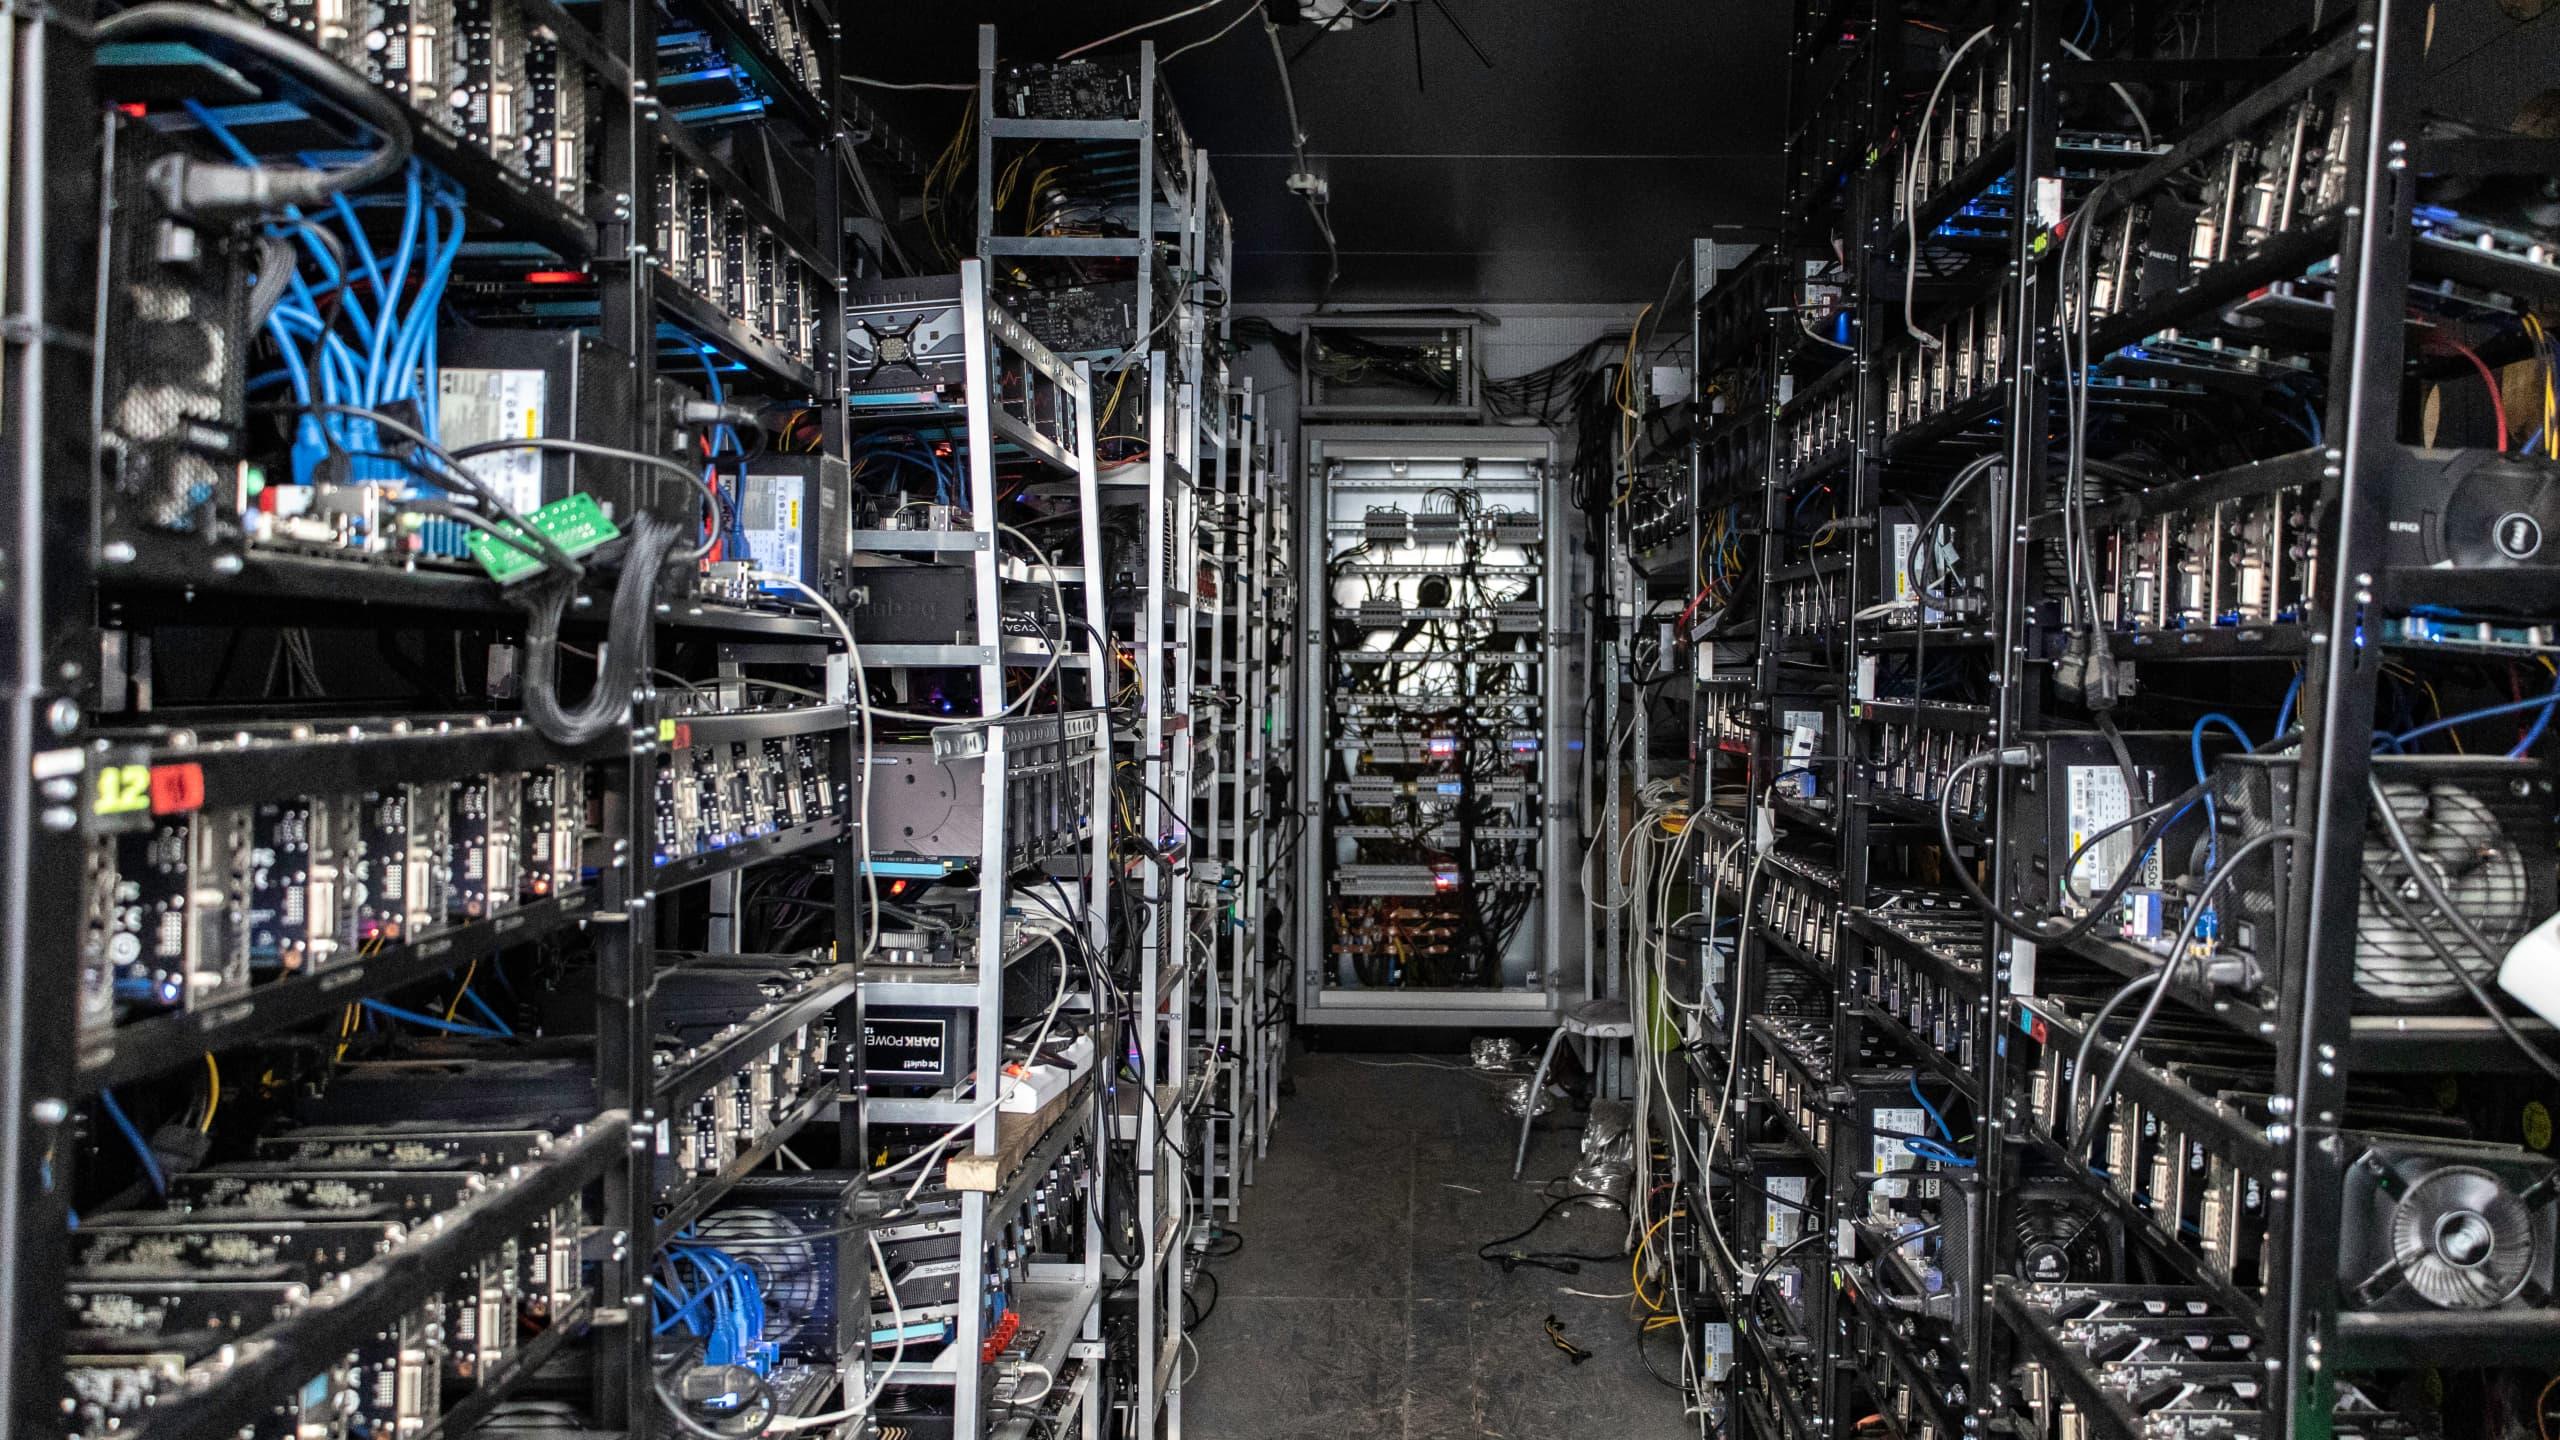 Wnętrze kontenera z koparkami kryptowalut